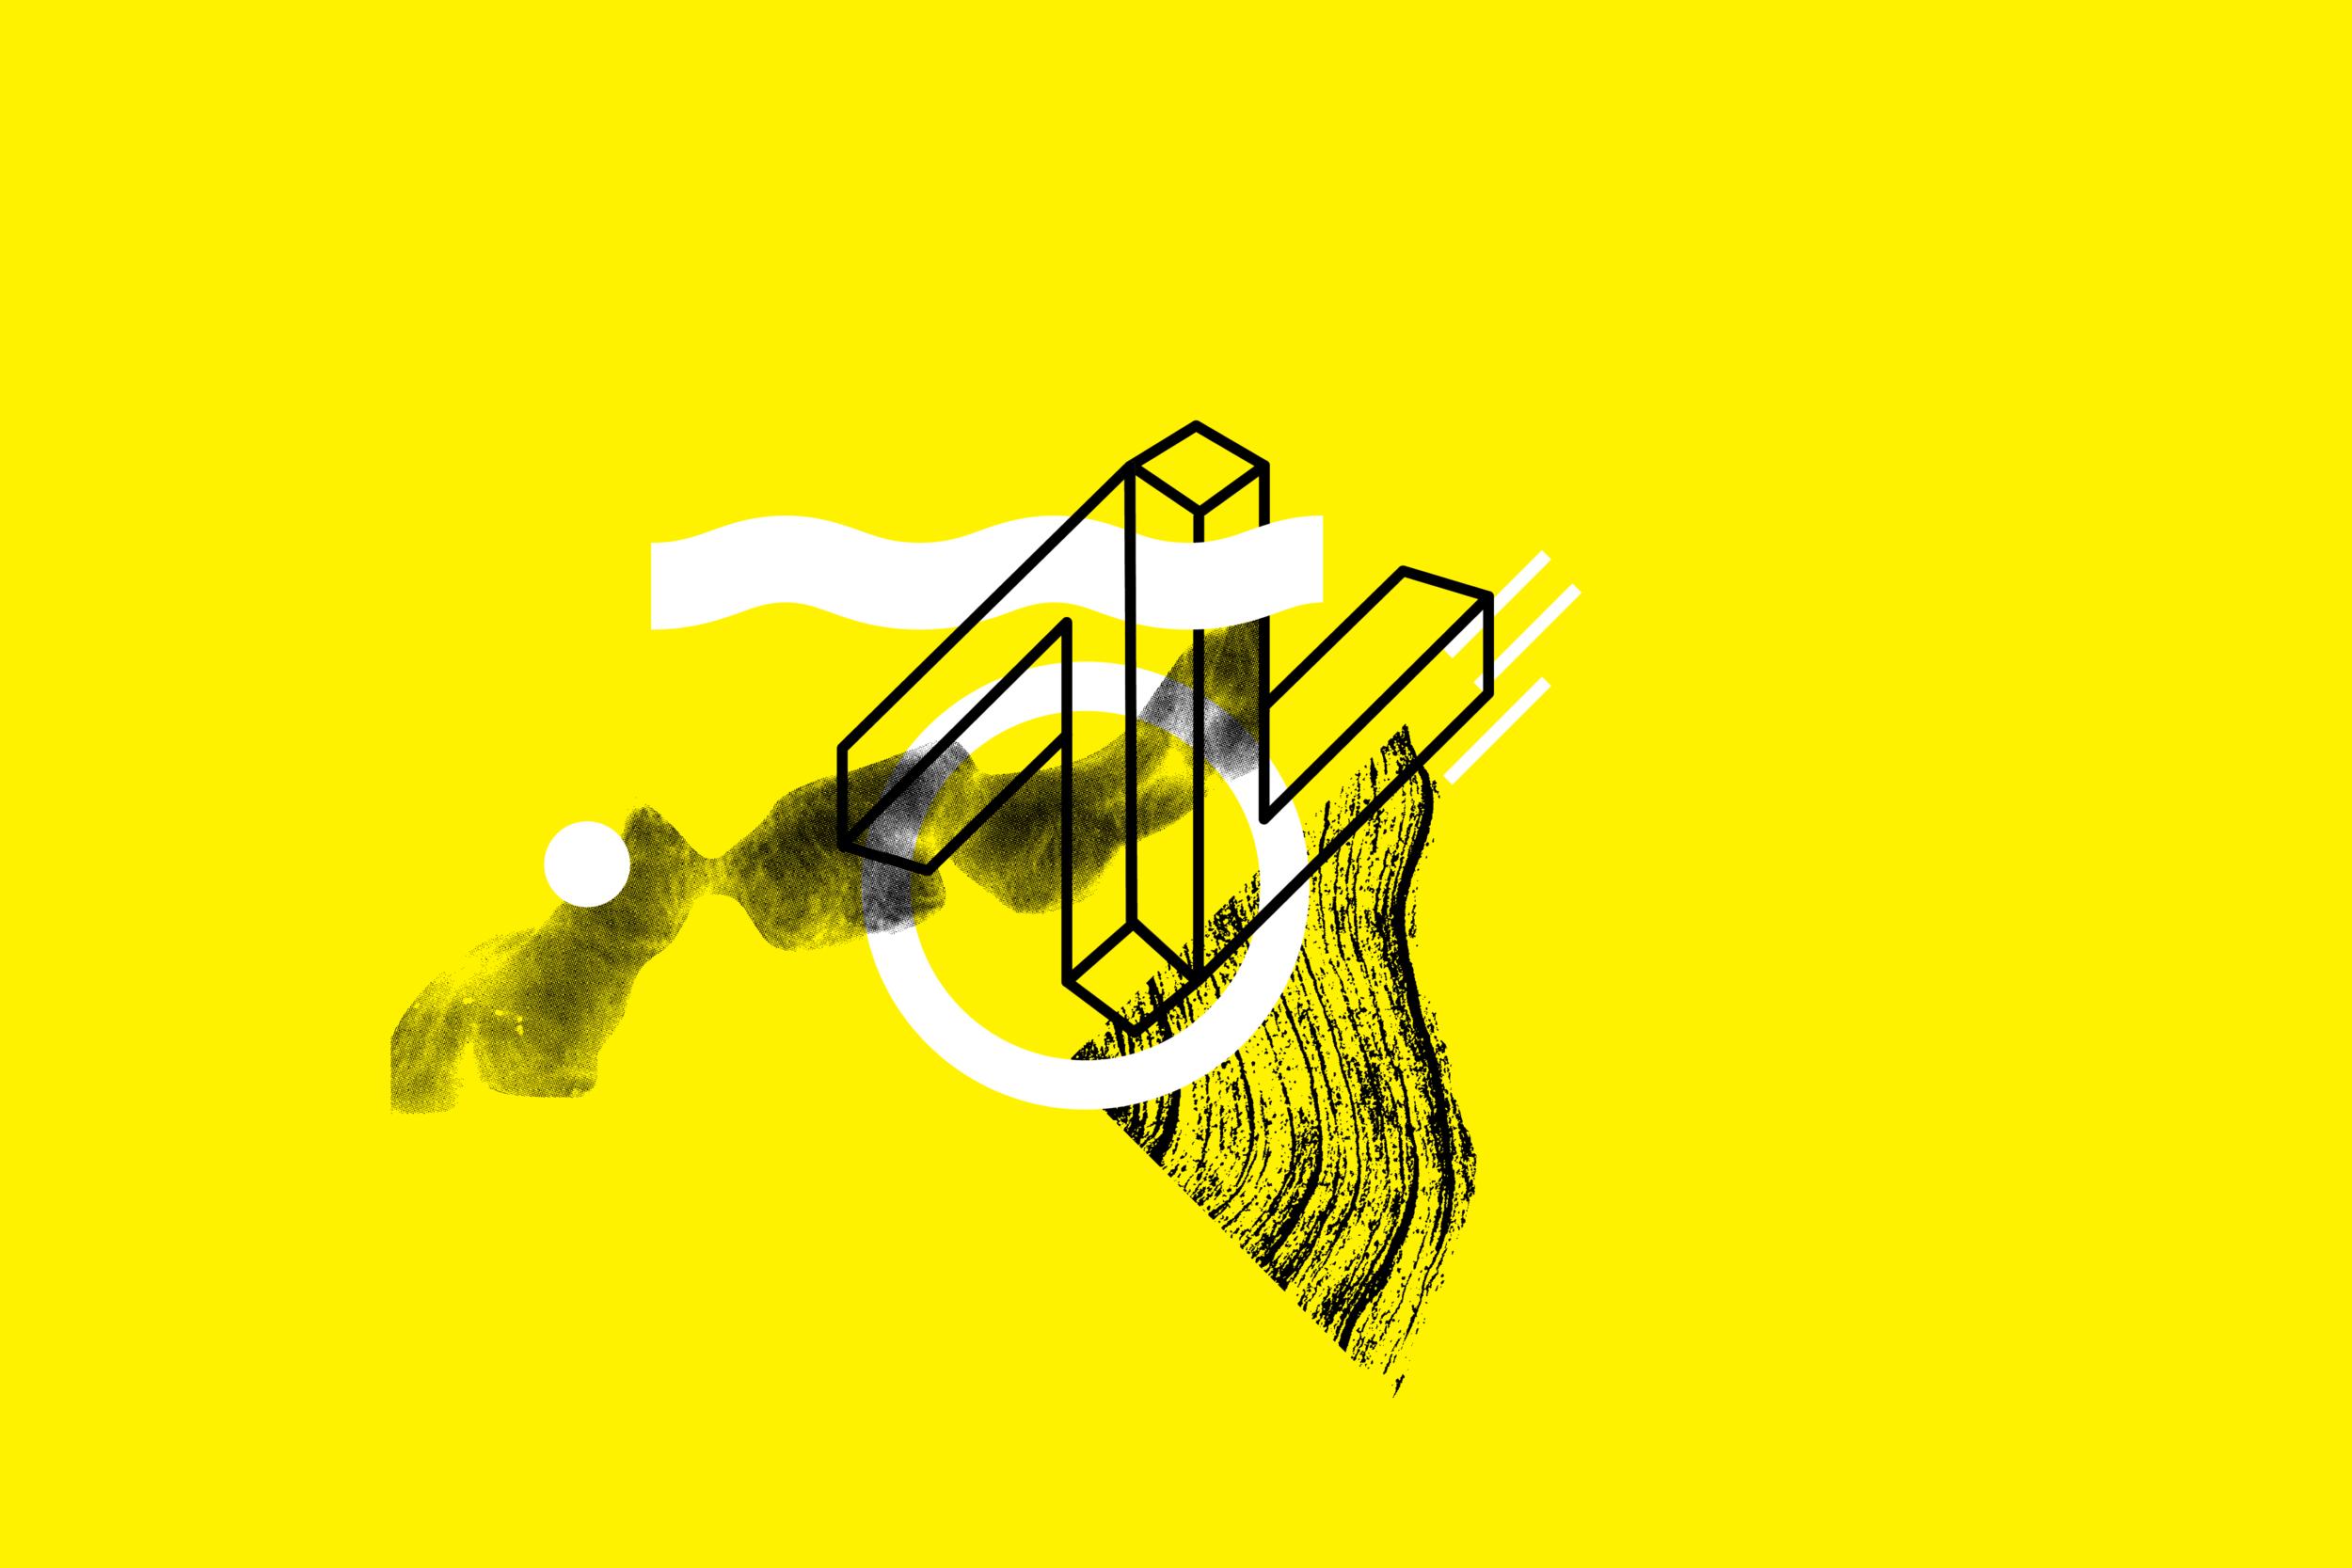 L&L_yellow-icon.png